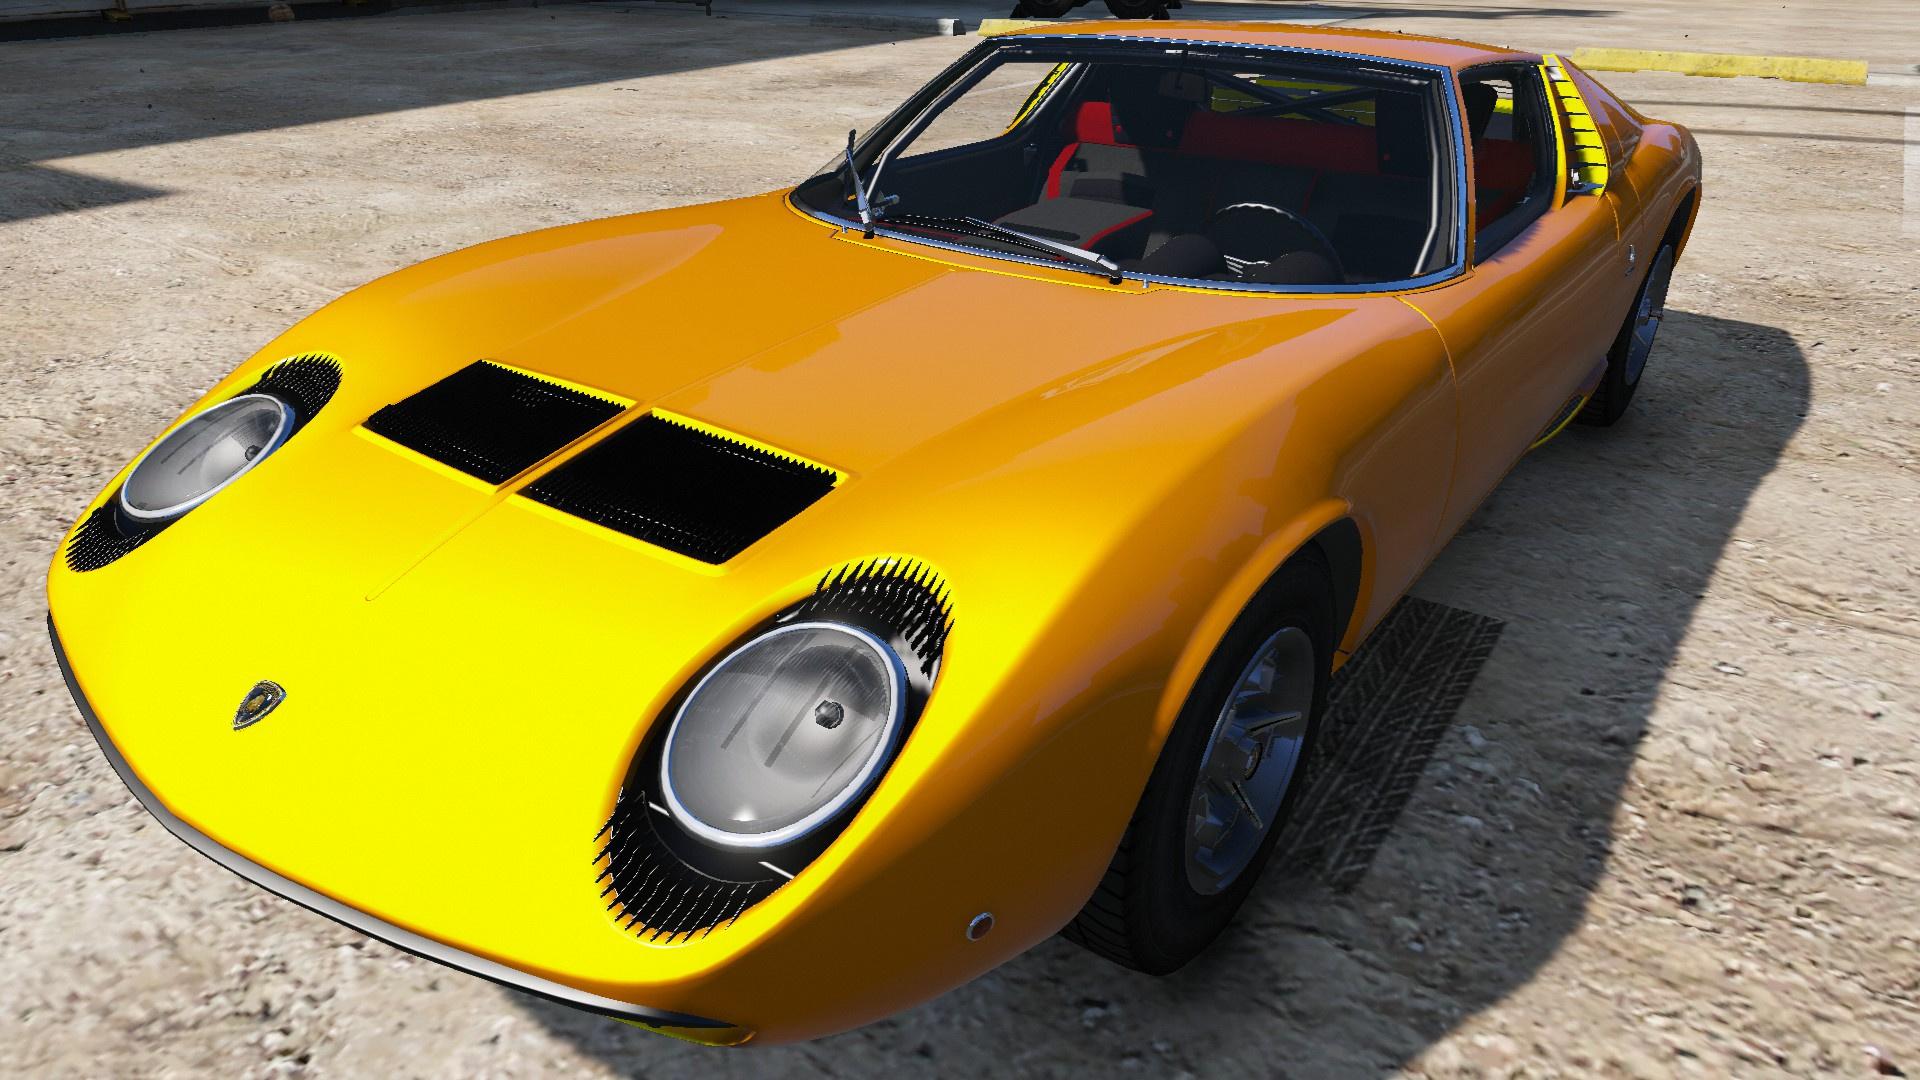 1967 Lamborghini Miura P400 Gta5 Mods Com